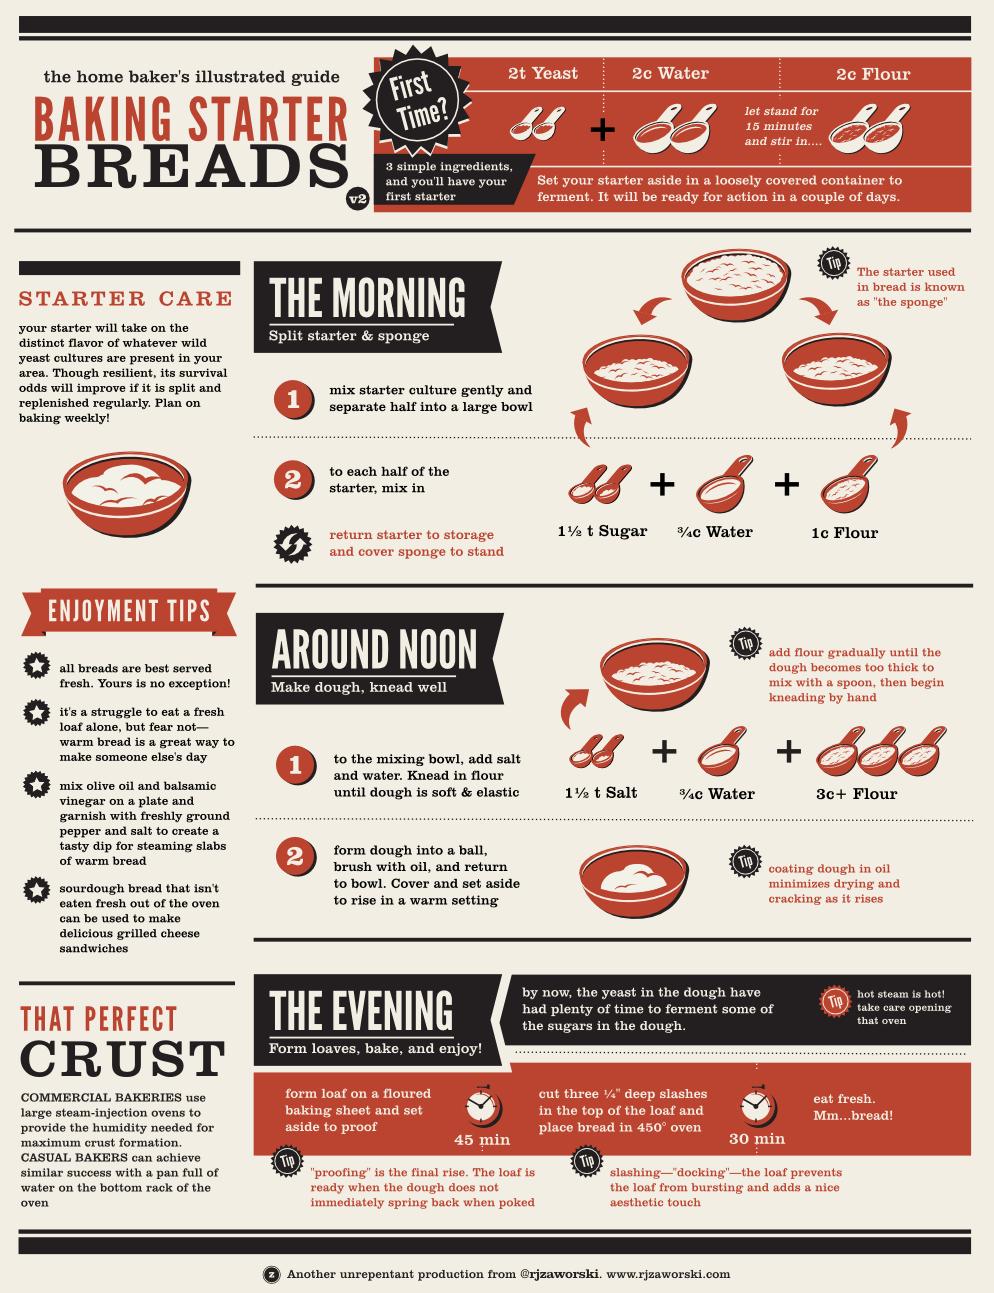 Illustrated guide to sourdough bread